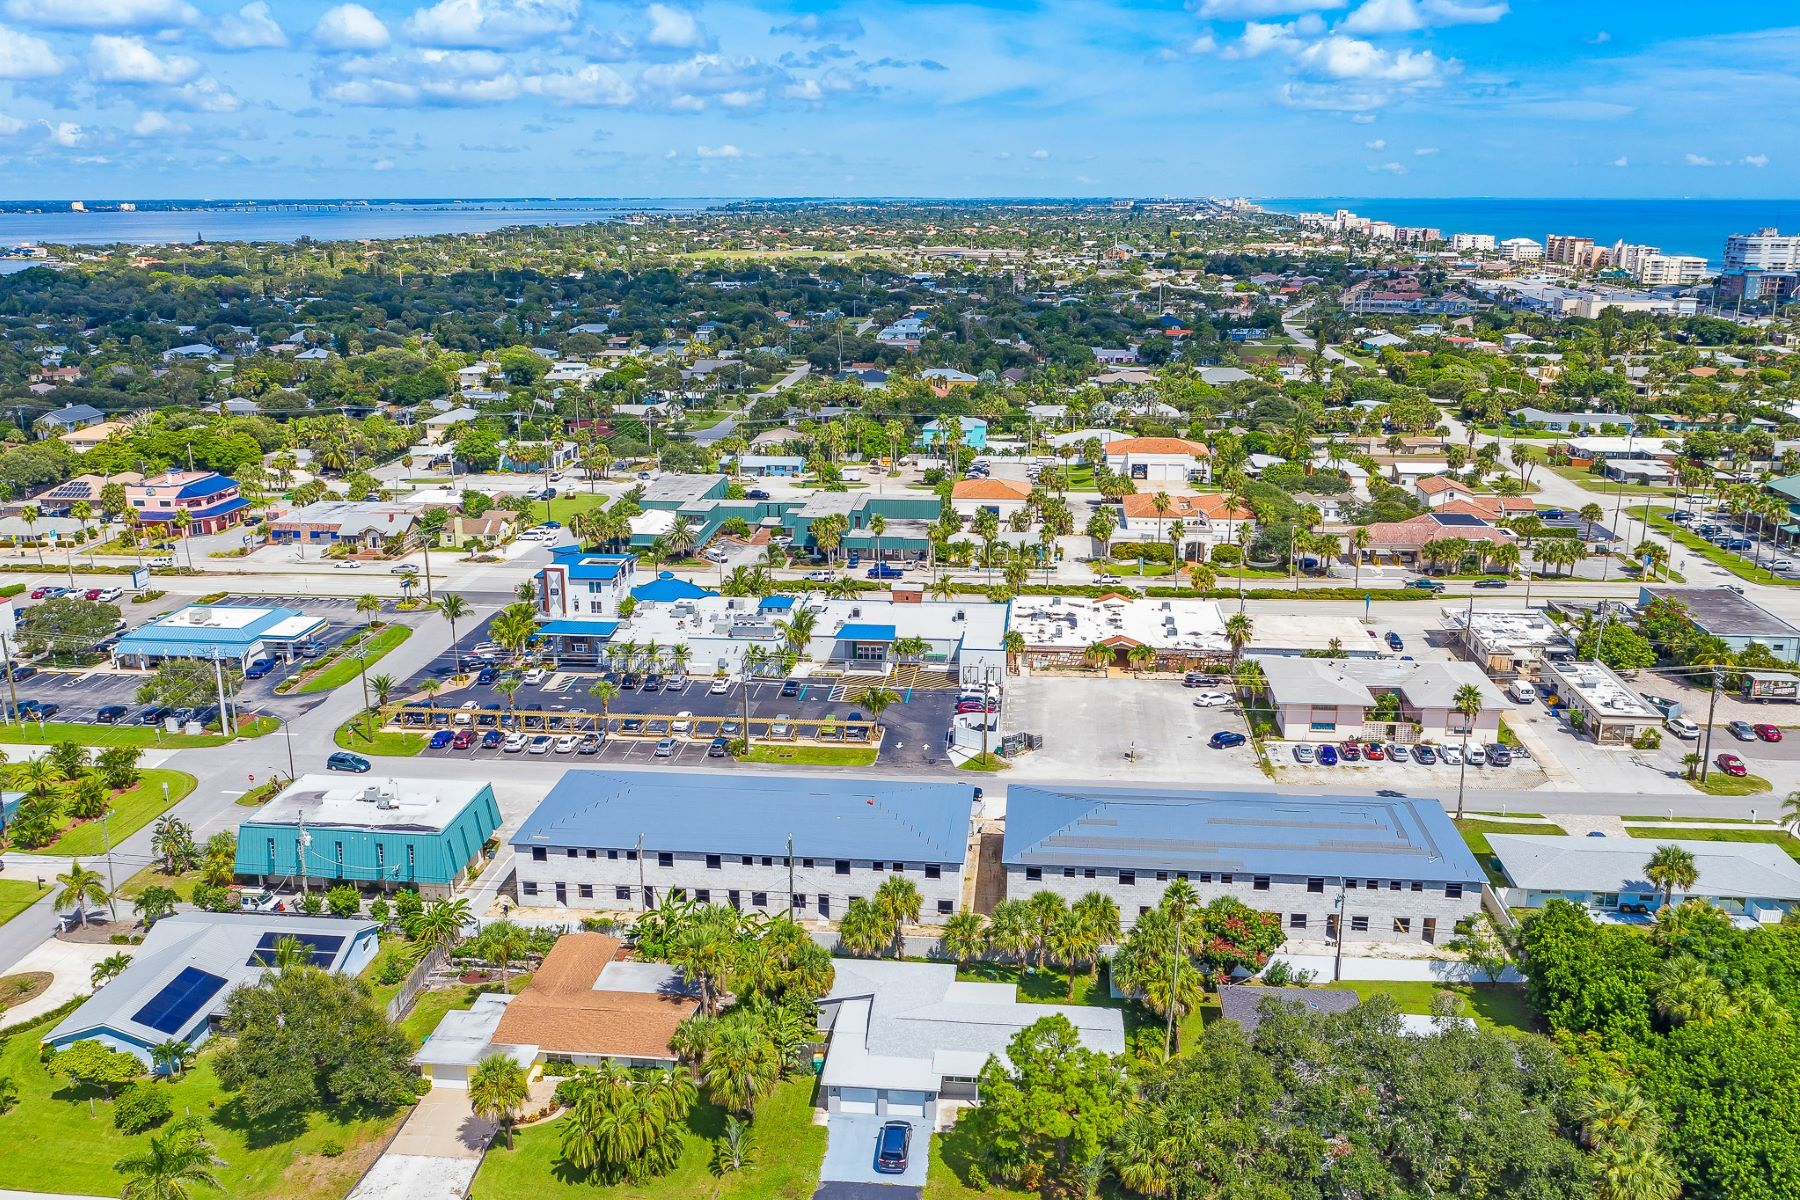 townhouses 為 出售 在 225 6th Avenue, # 213, Indialantic, FL 225 6th Avenue, # 213 Indialantic, 佛羅里達州 32903 美國